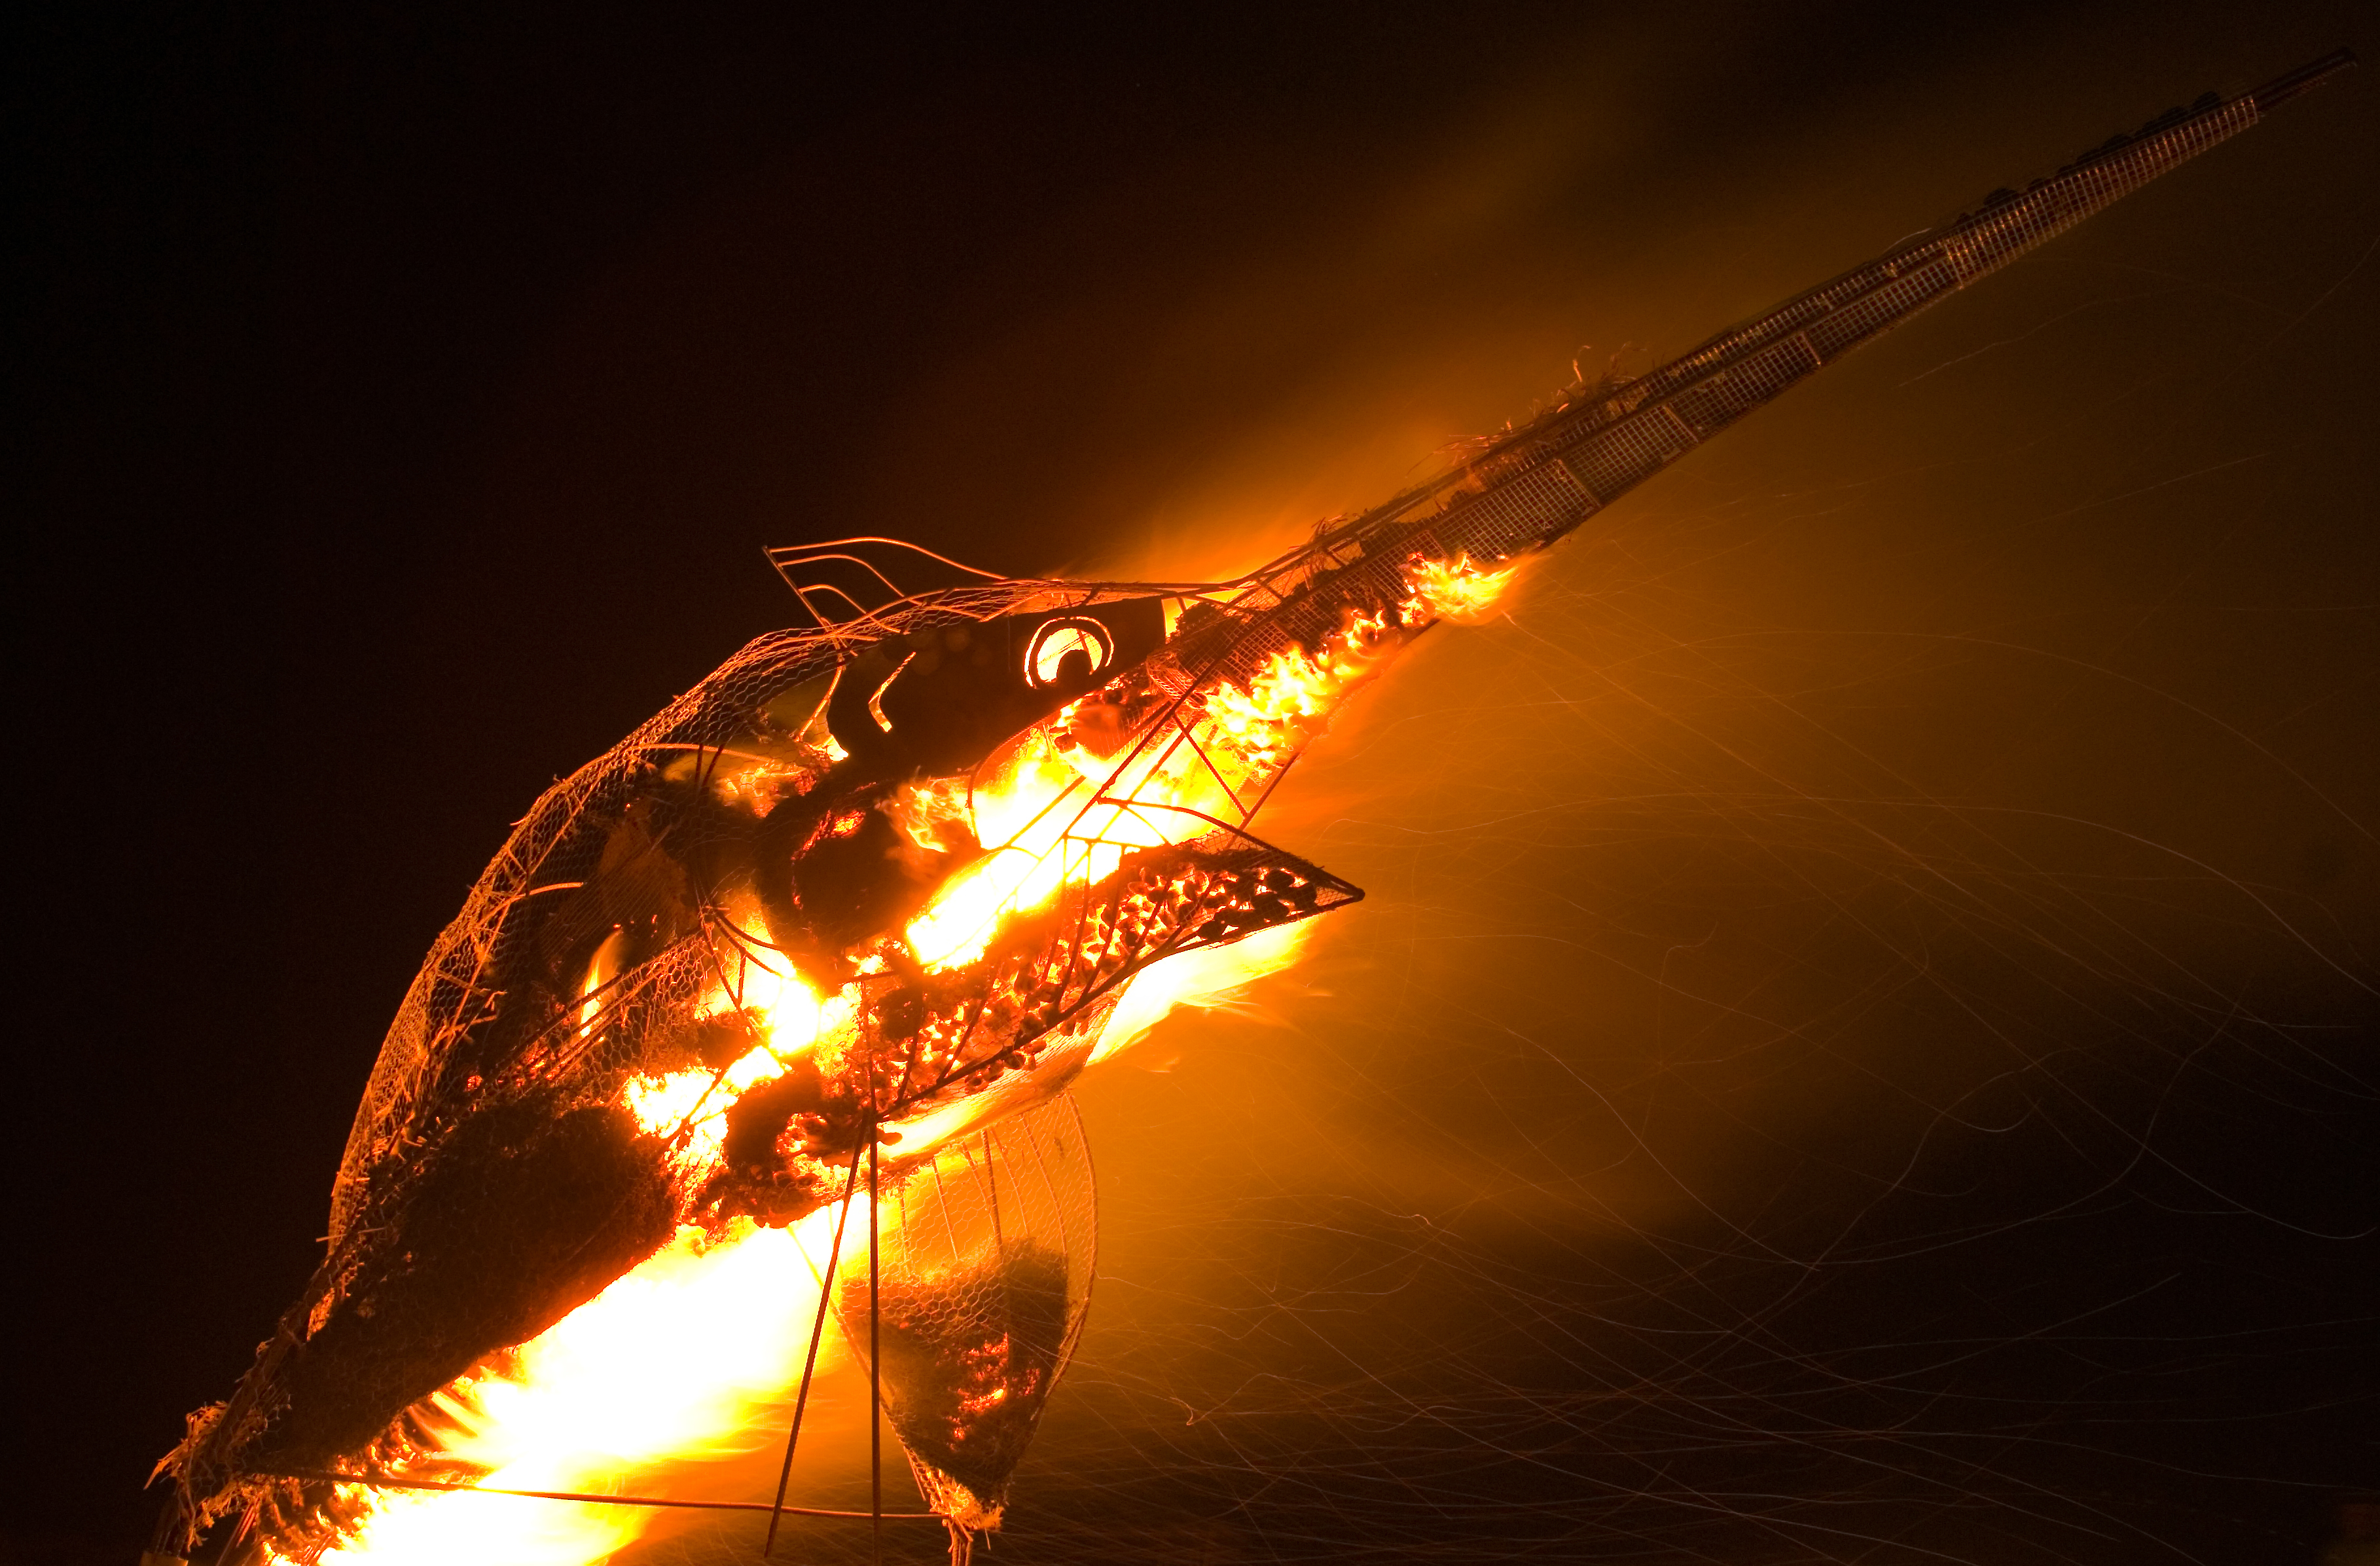 DUNCANBRAKEburningmarlin